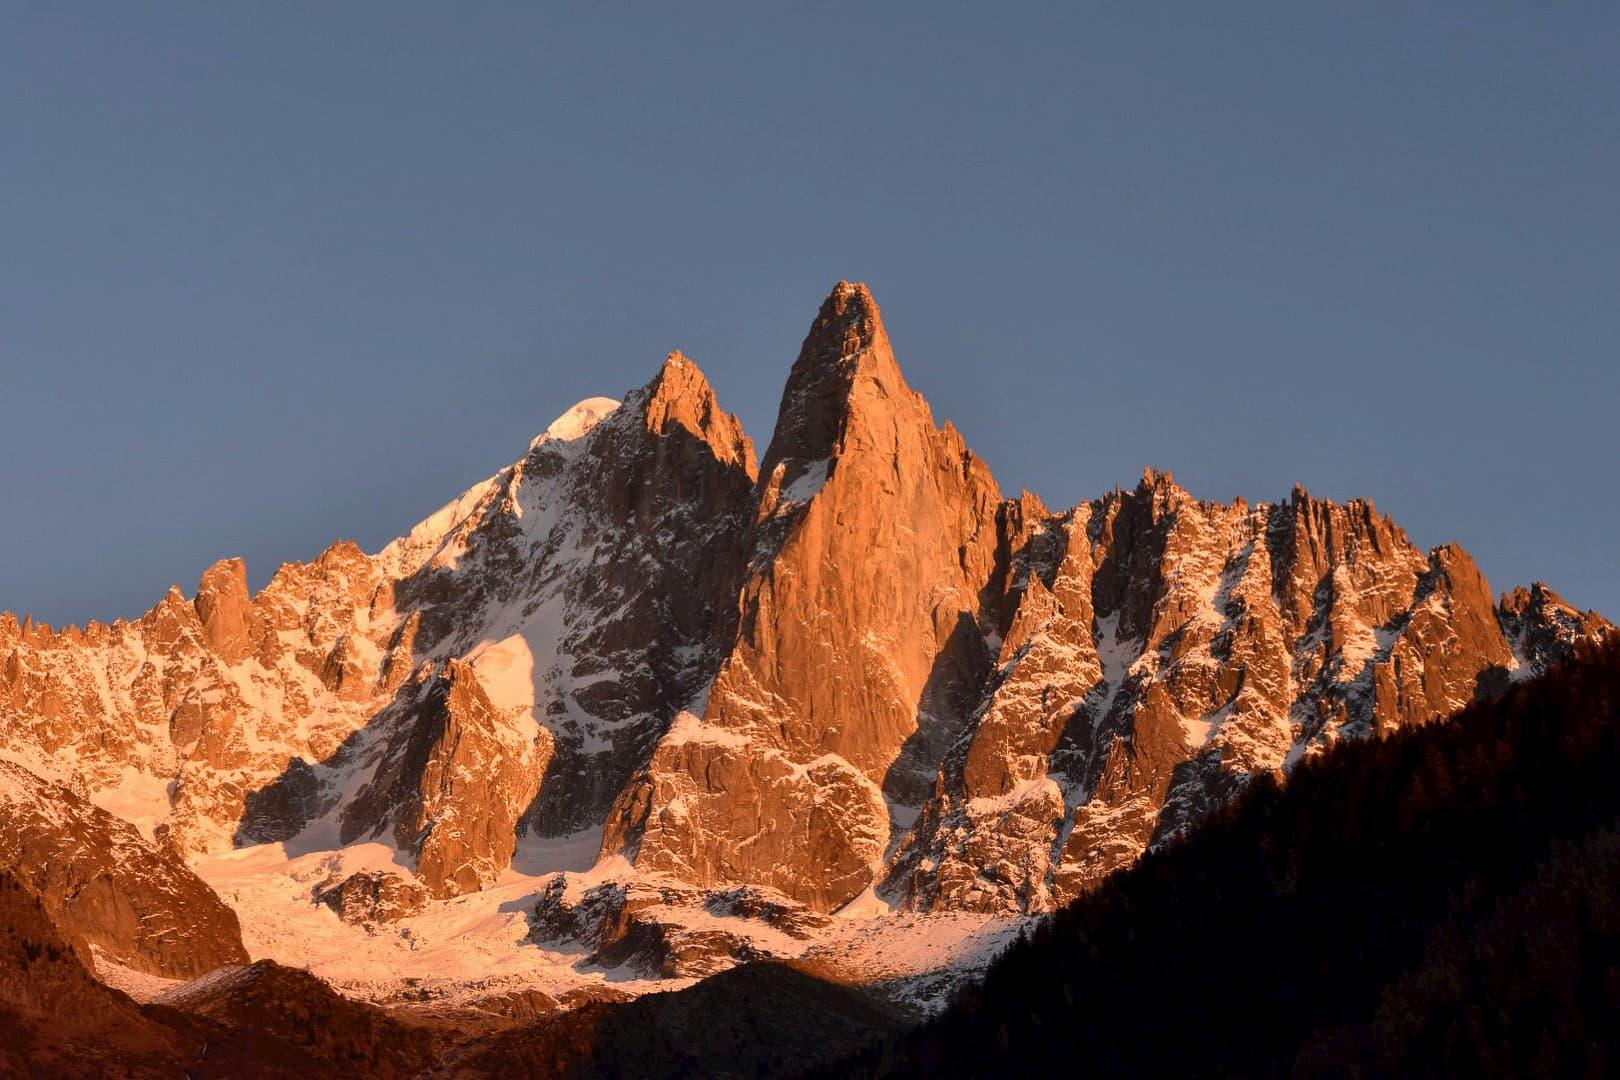 Alpenglow on Les Drus